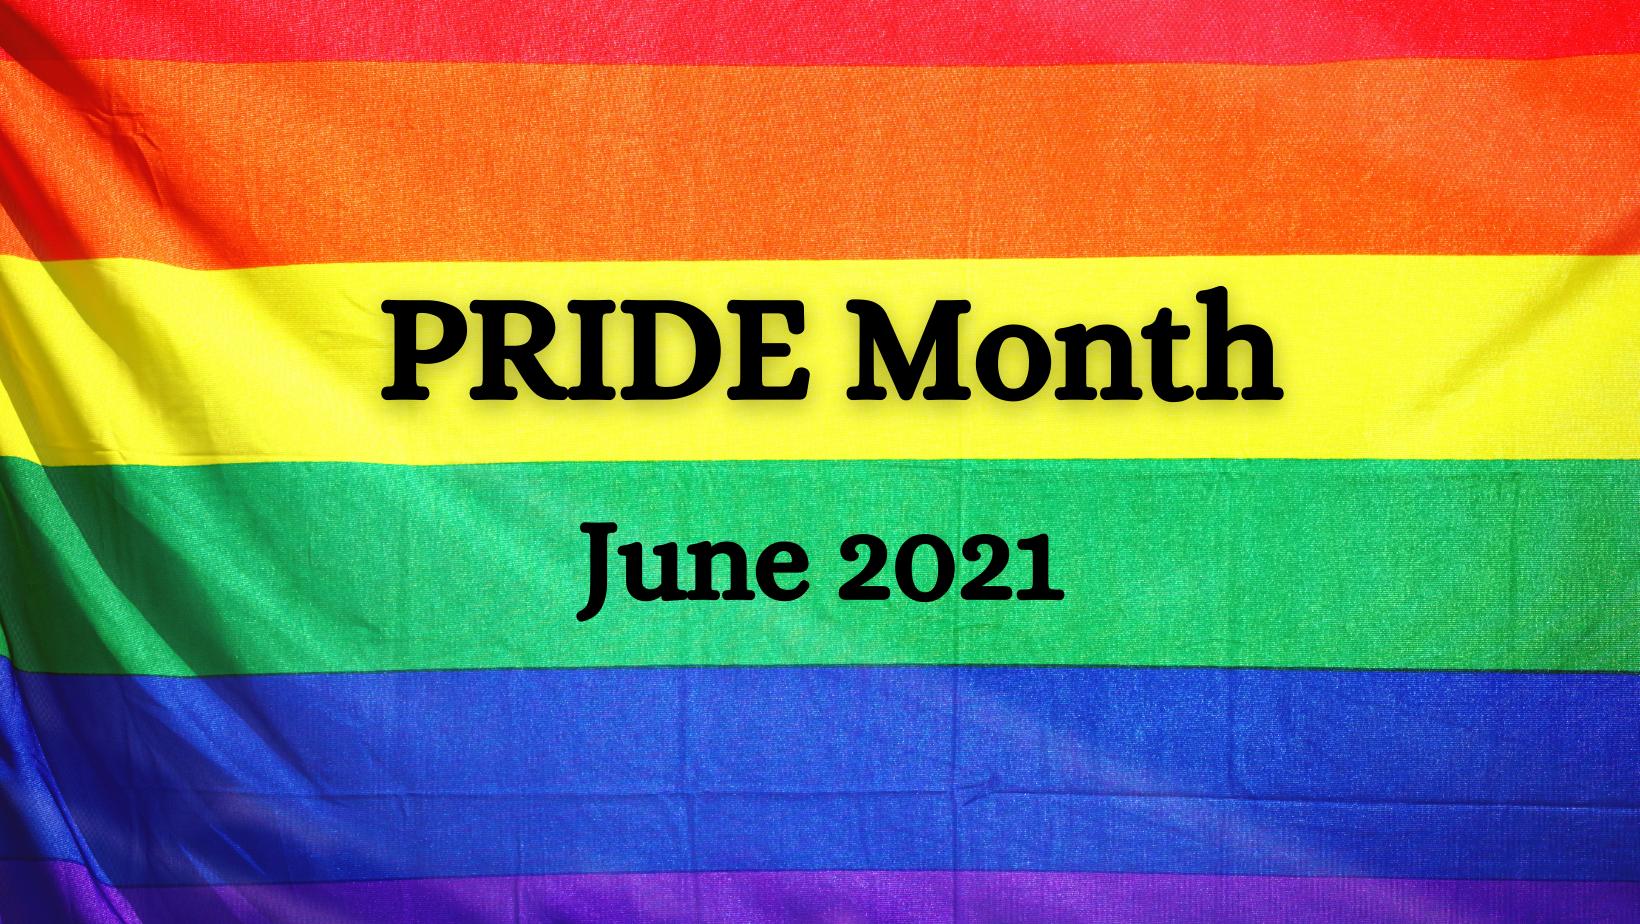 PRIDE Month June 2021